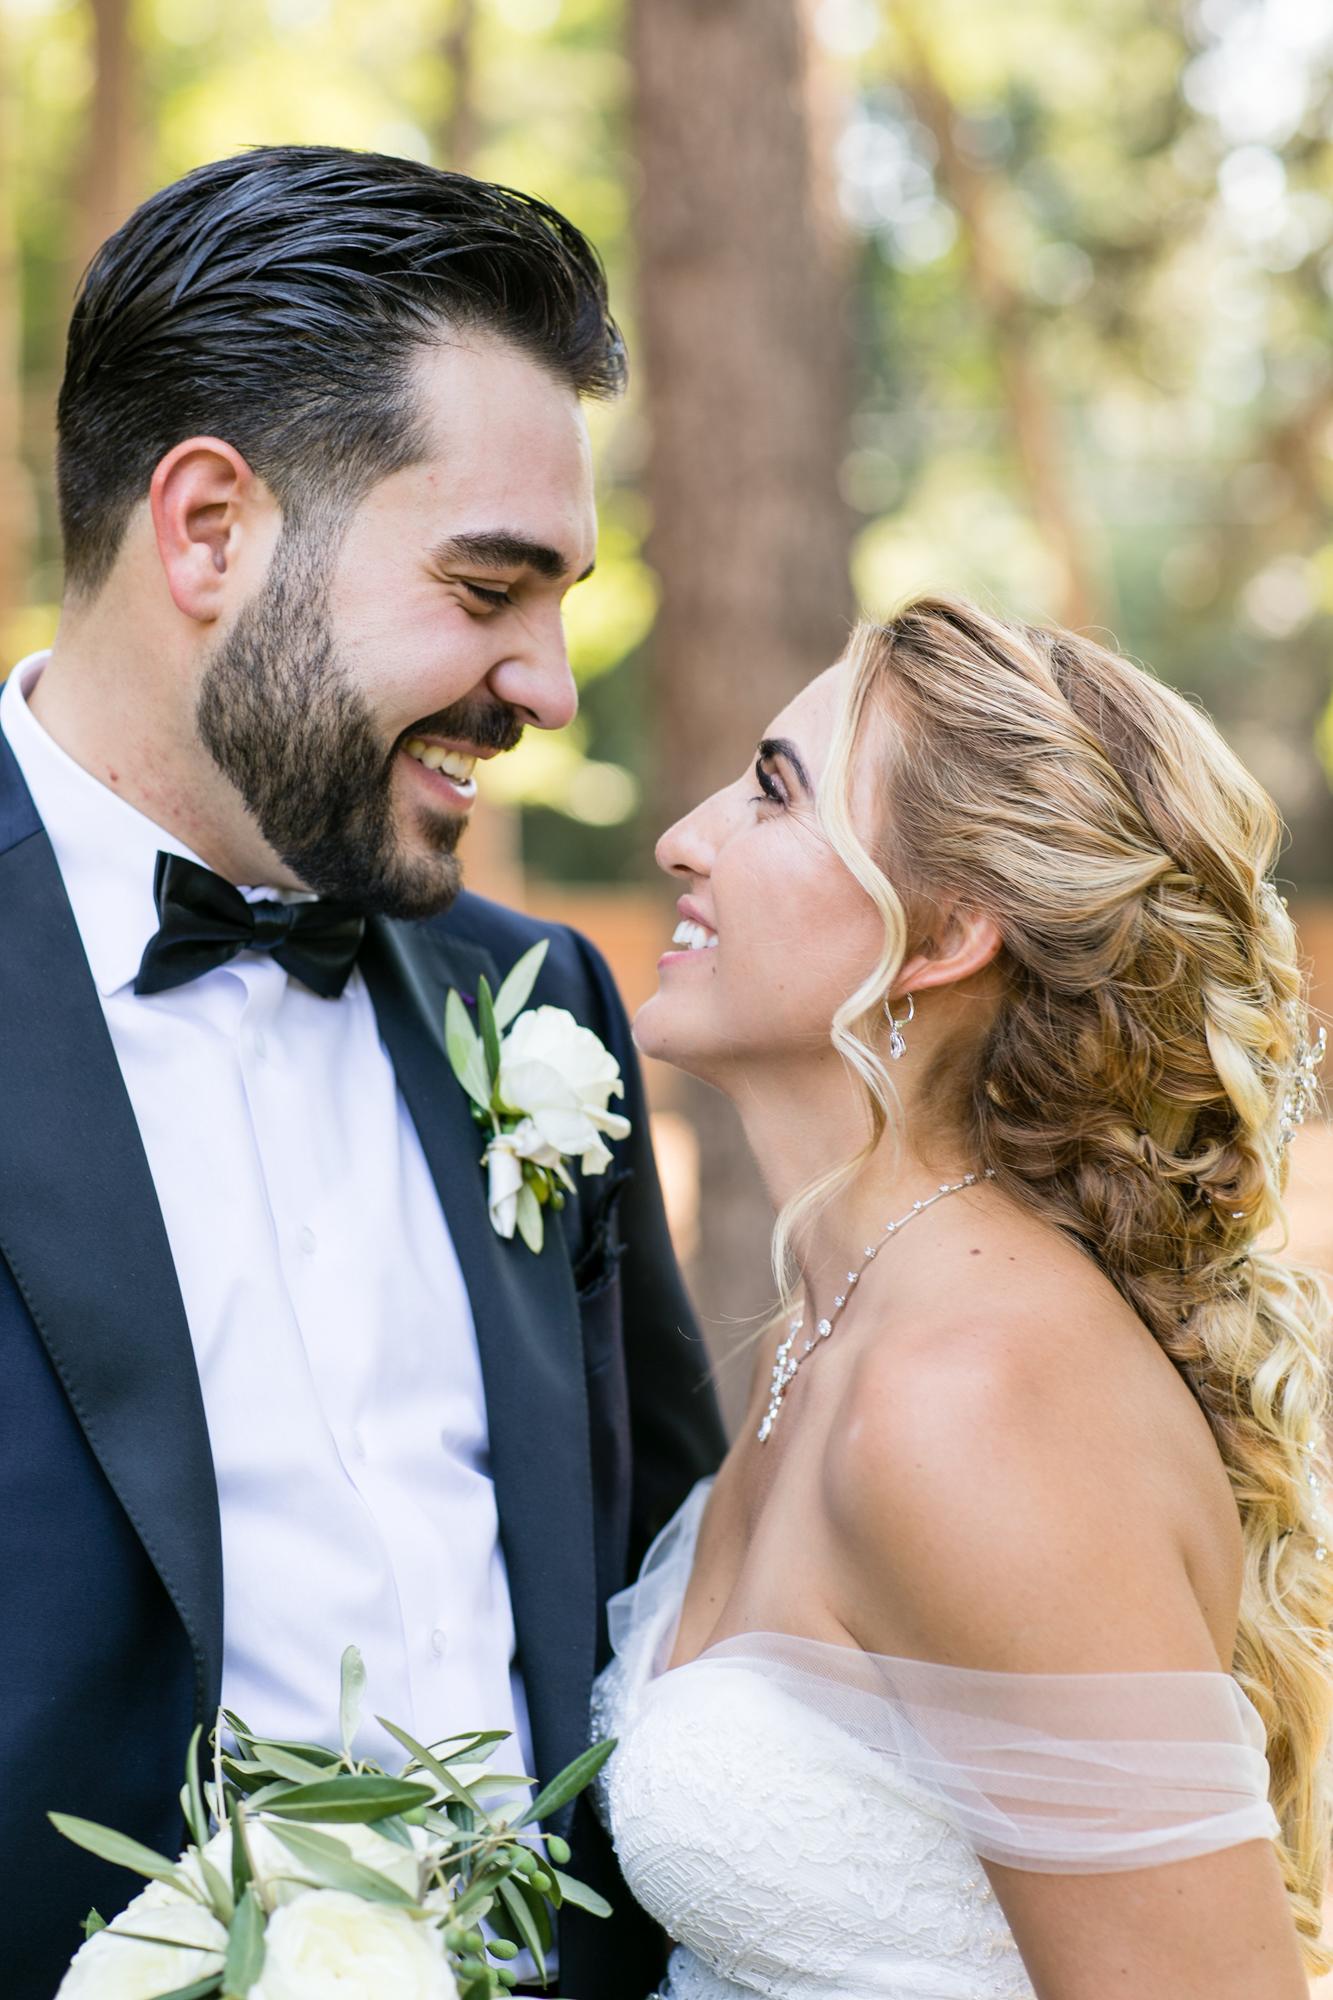 greek-wedding-salt-lake-city-utah-30.jpg